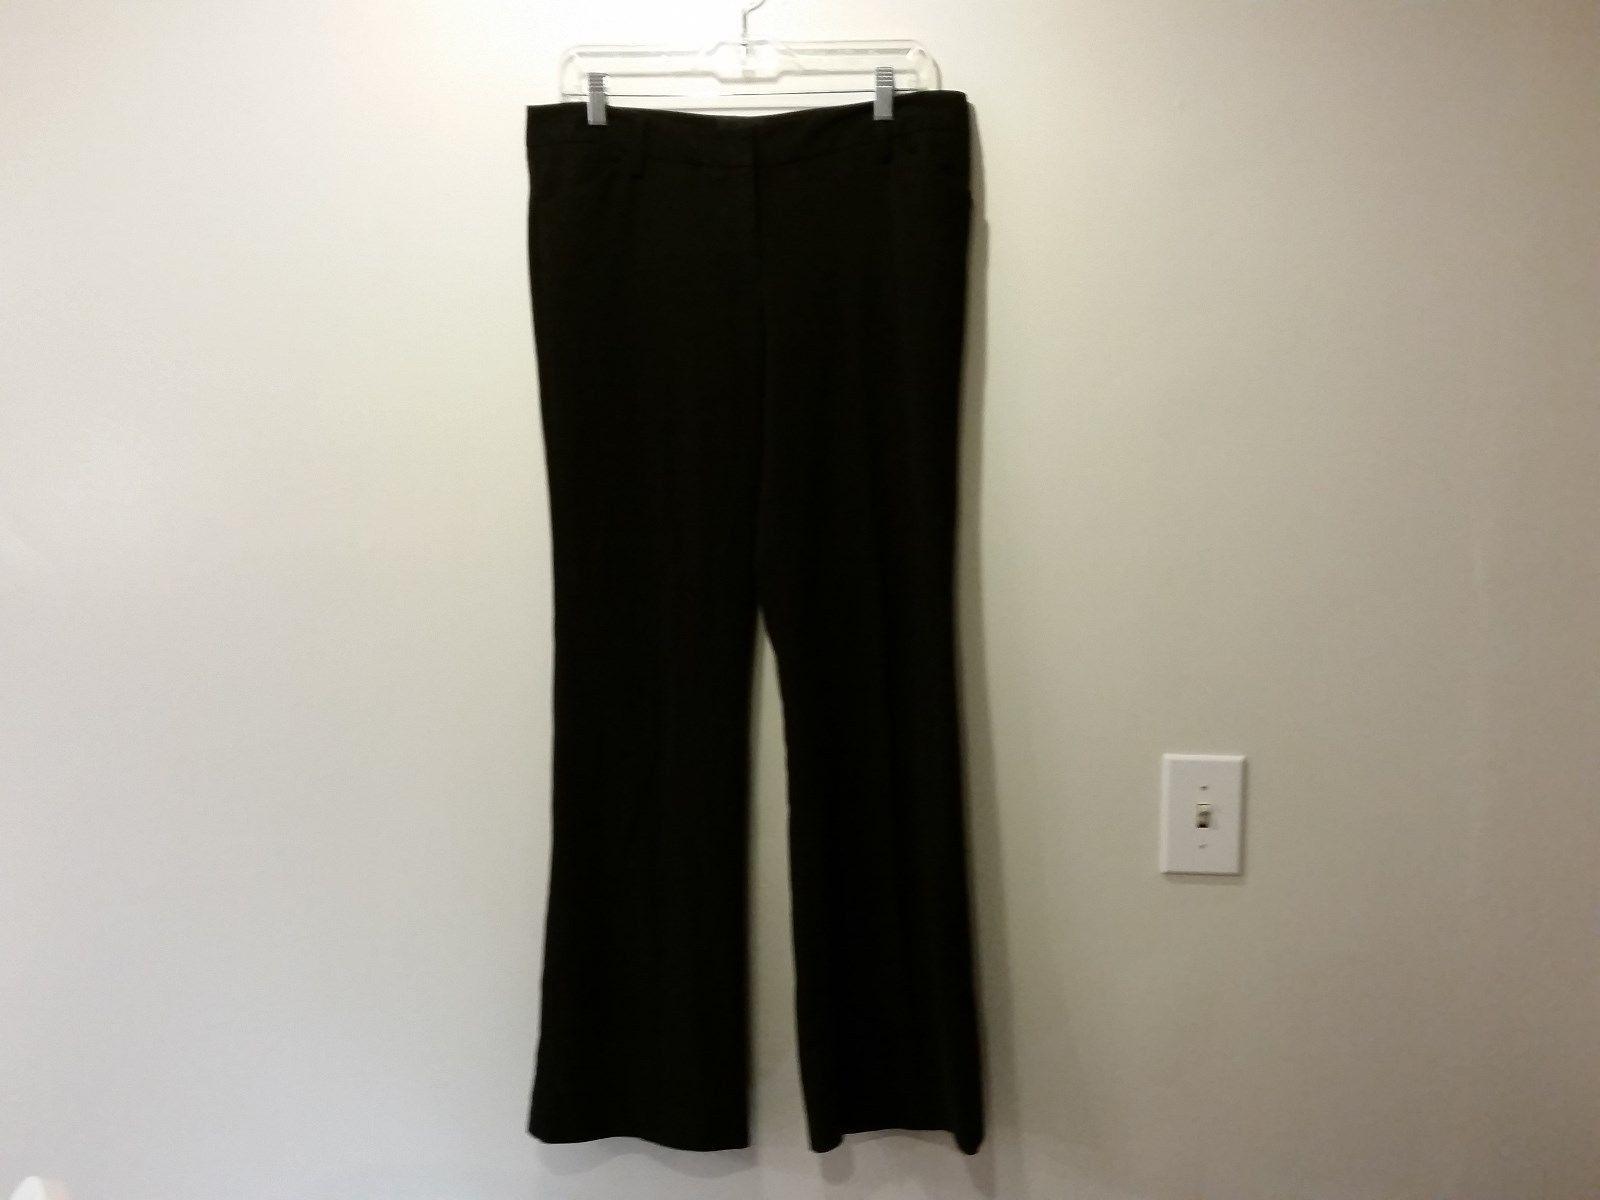 Star City Logan Size 9 Black Dress Pants Zipper and Slide Closure